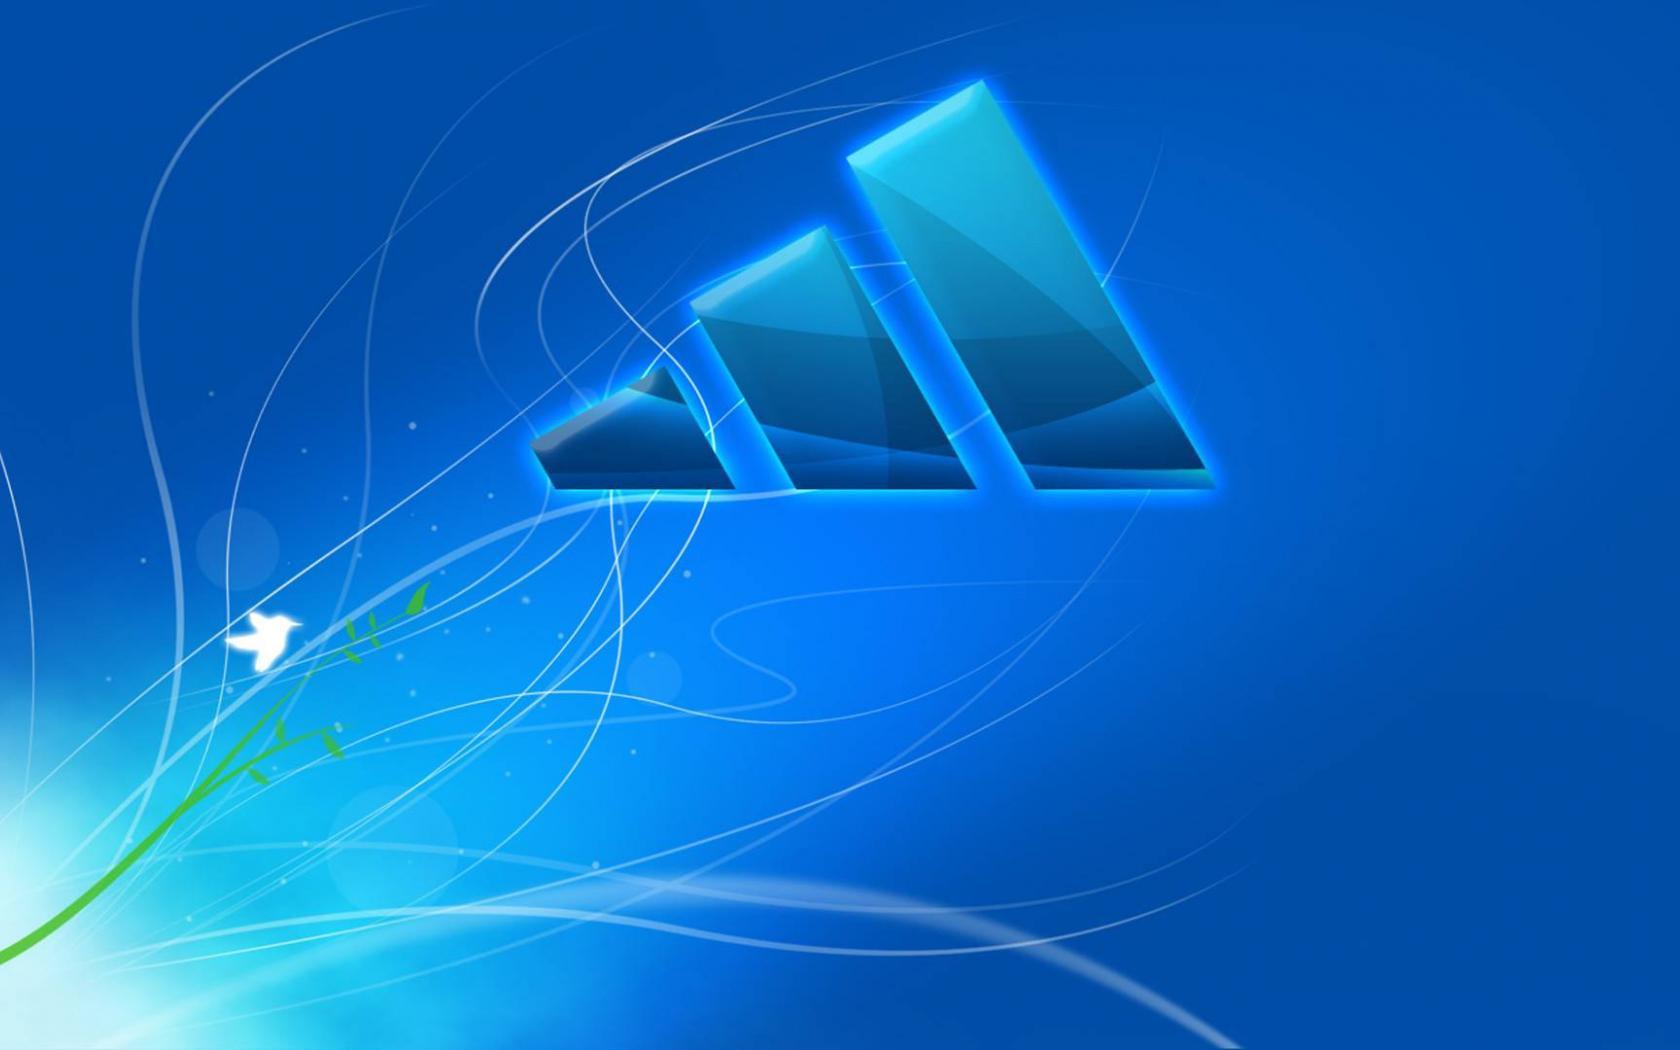 Windows seven wallpaper [10] HQ WALLPAPER - (#23420)